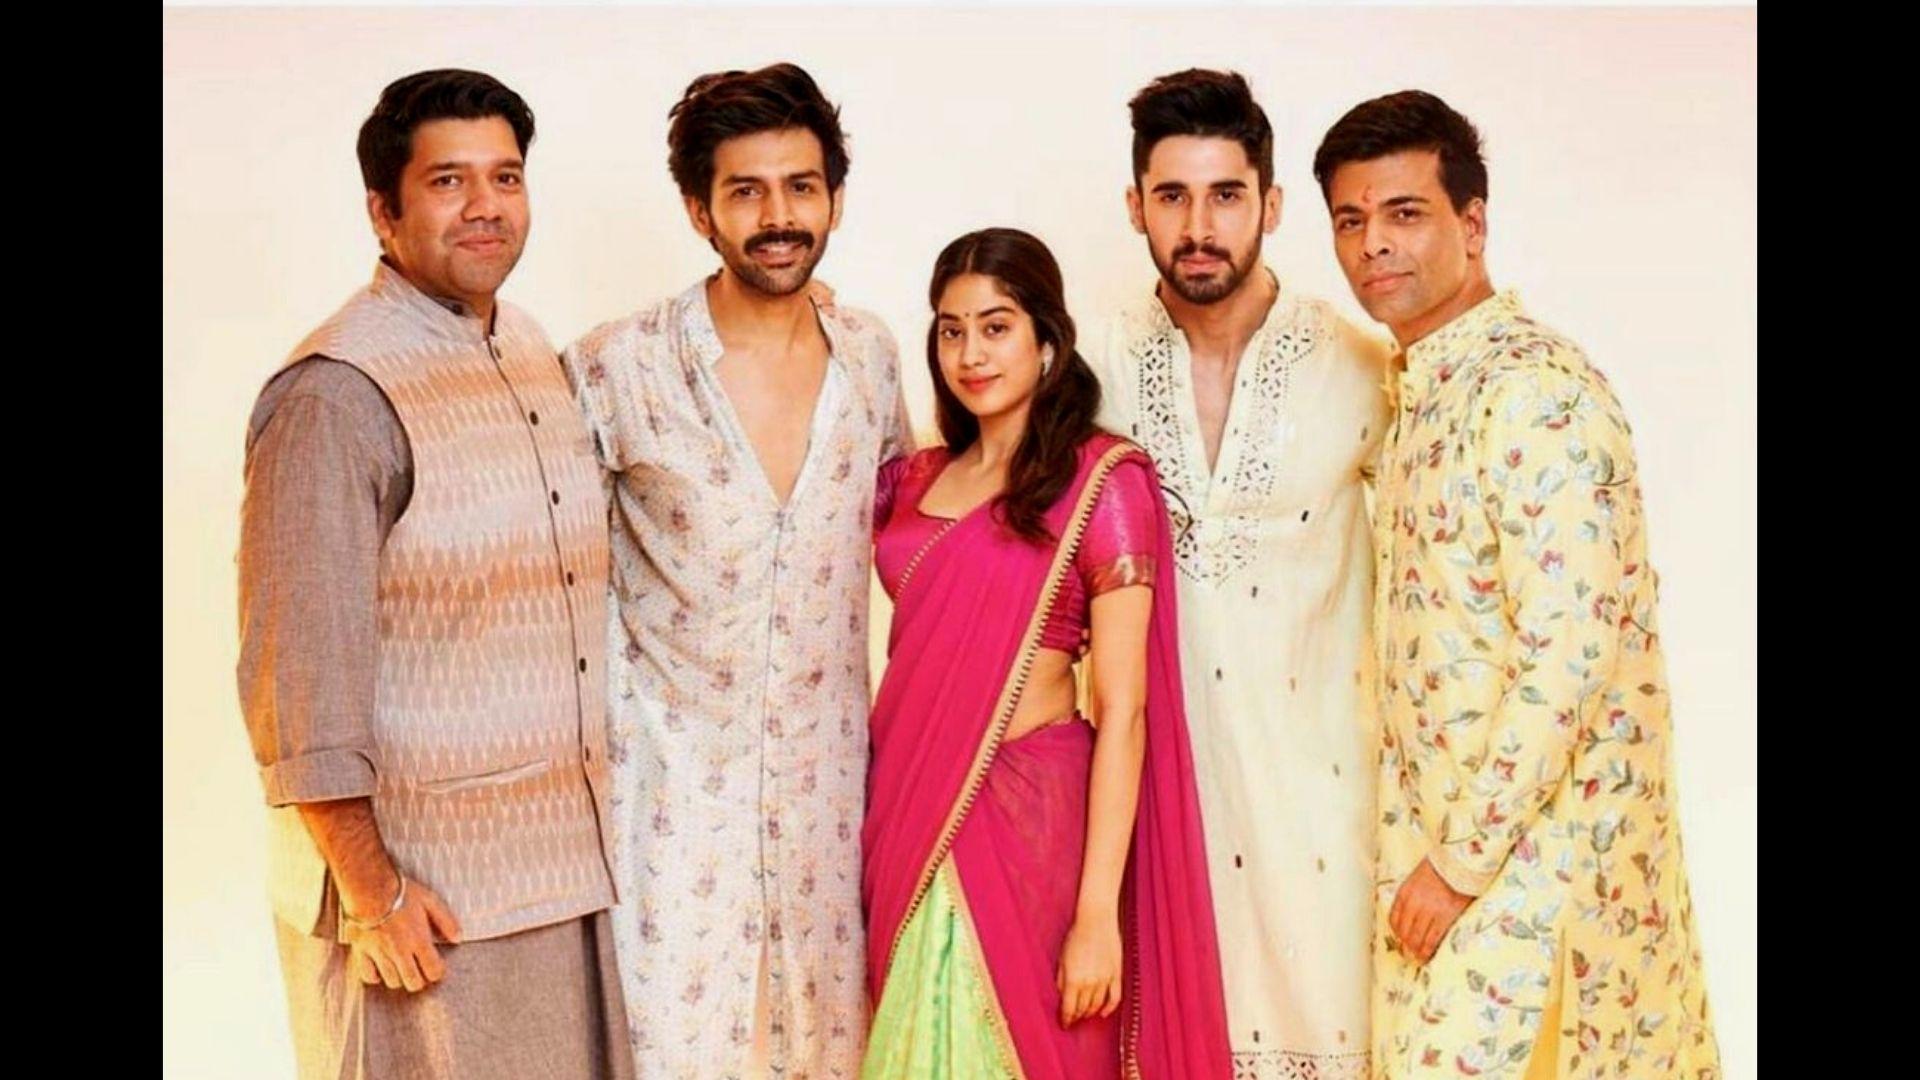 Janhvi Kapoor Opens Up On Dostana 2 Being Derailed Post Kartik Aaryan's Exit; Says 'It's Heartbreaking'